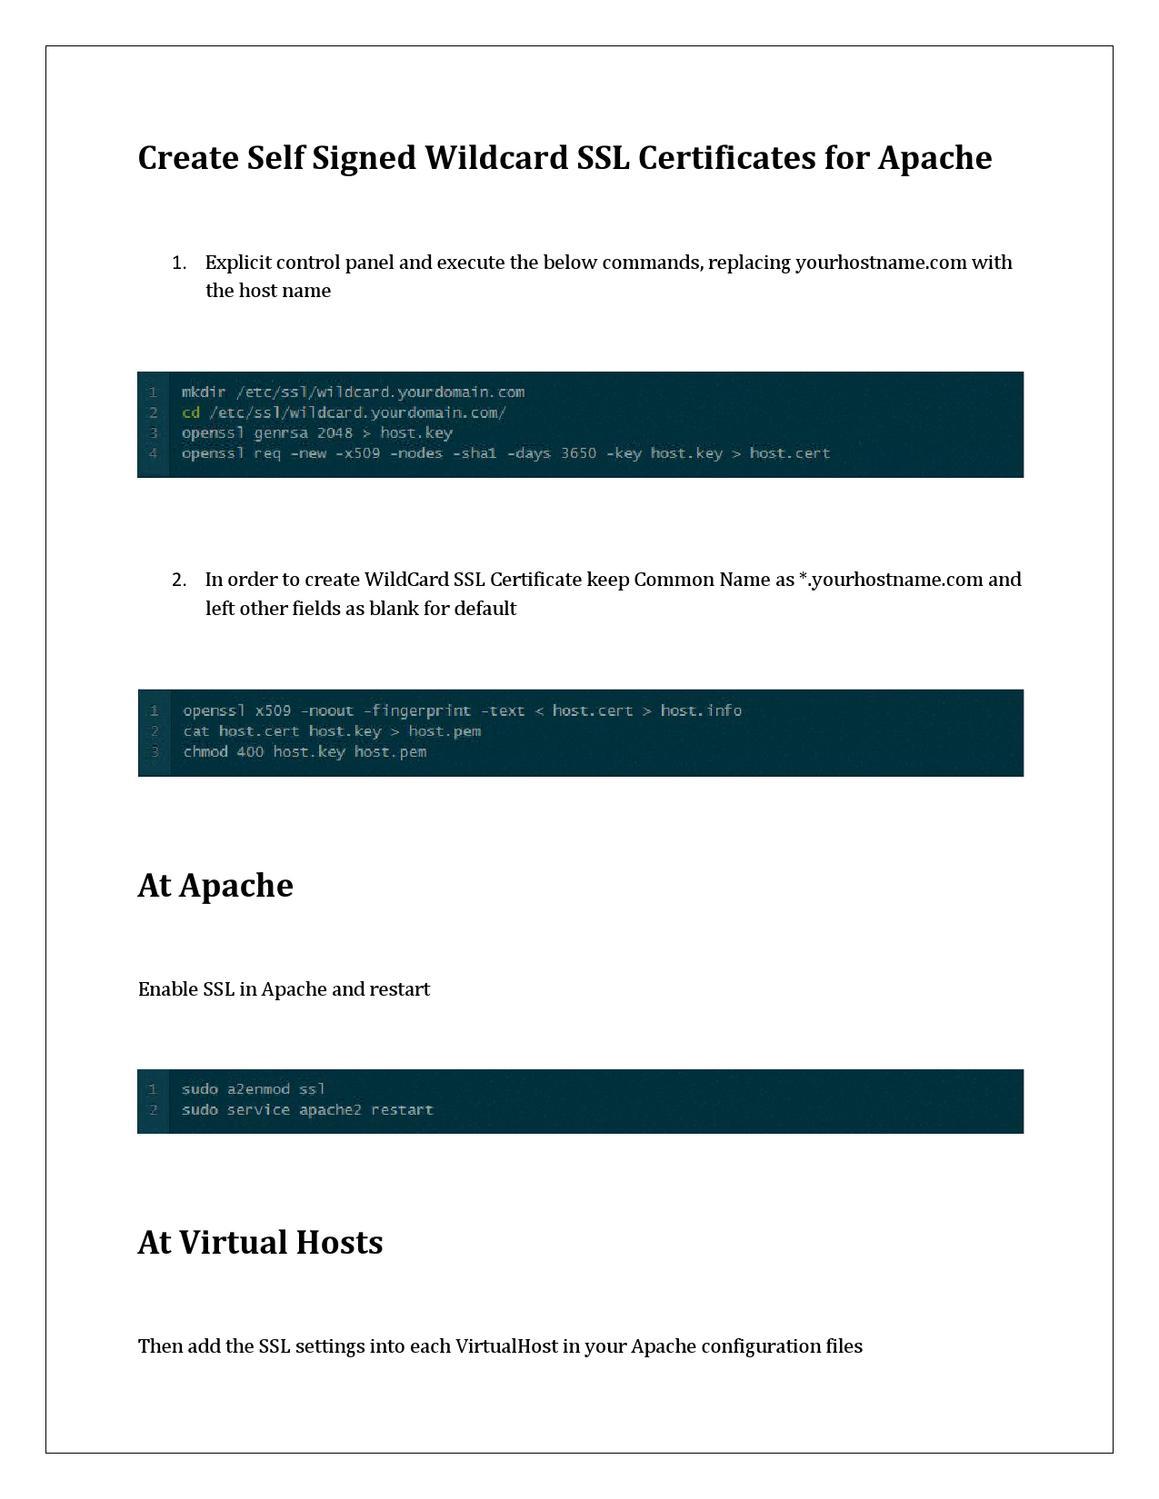 Create Self Signed Wildcard Ssl For Apache Rapidly Rapidsslonline